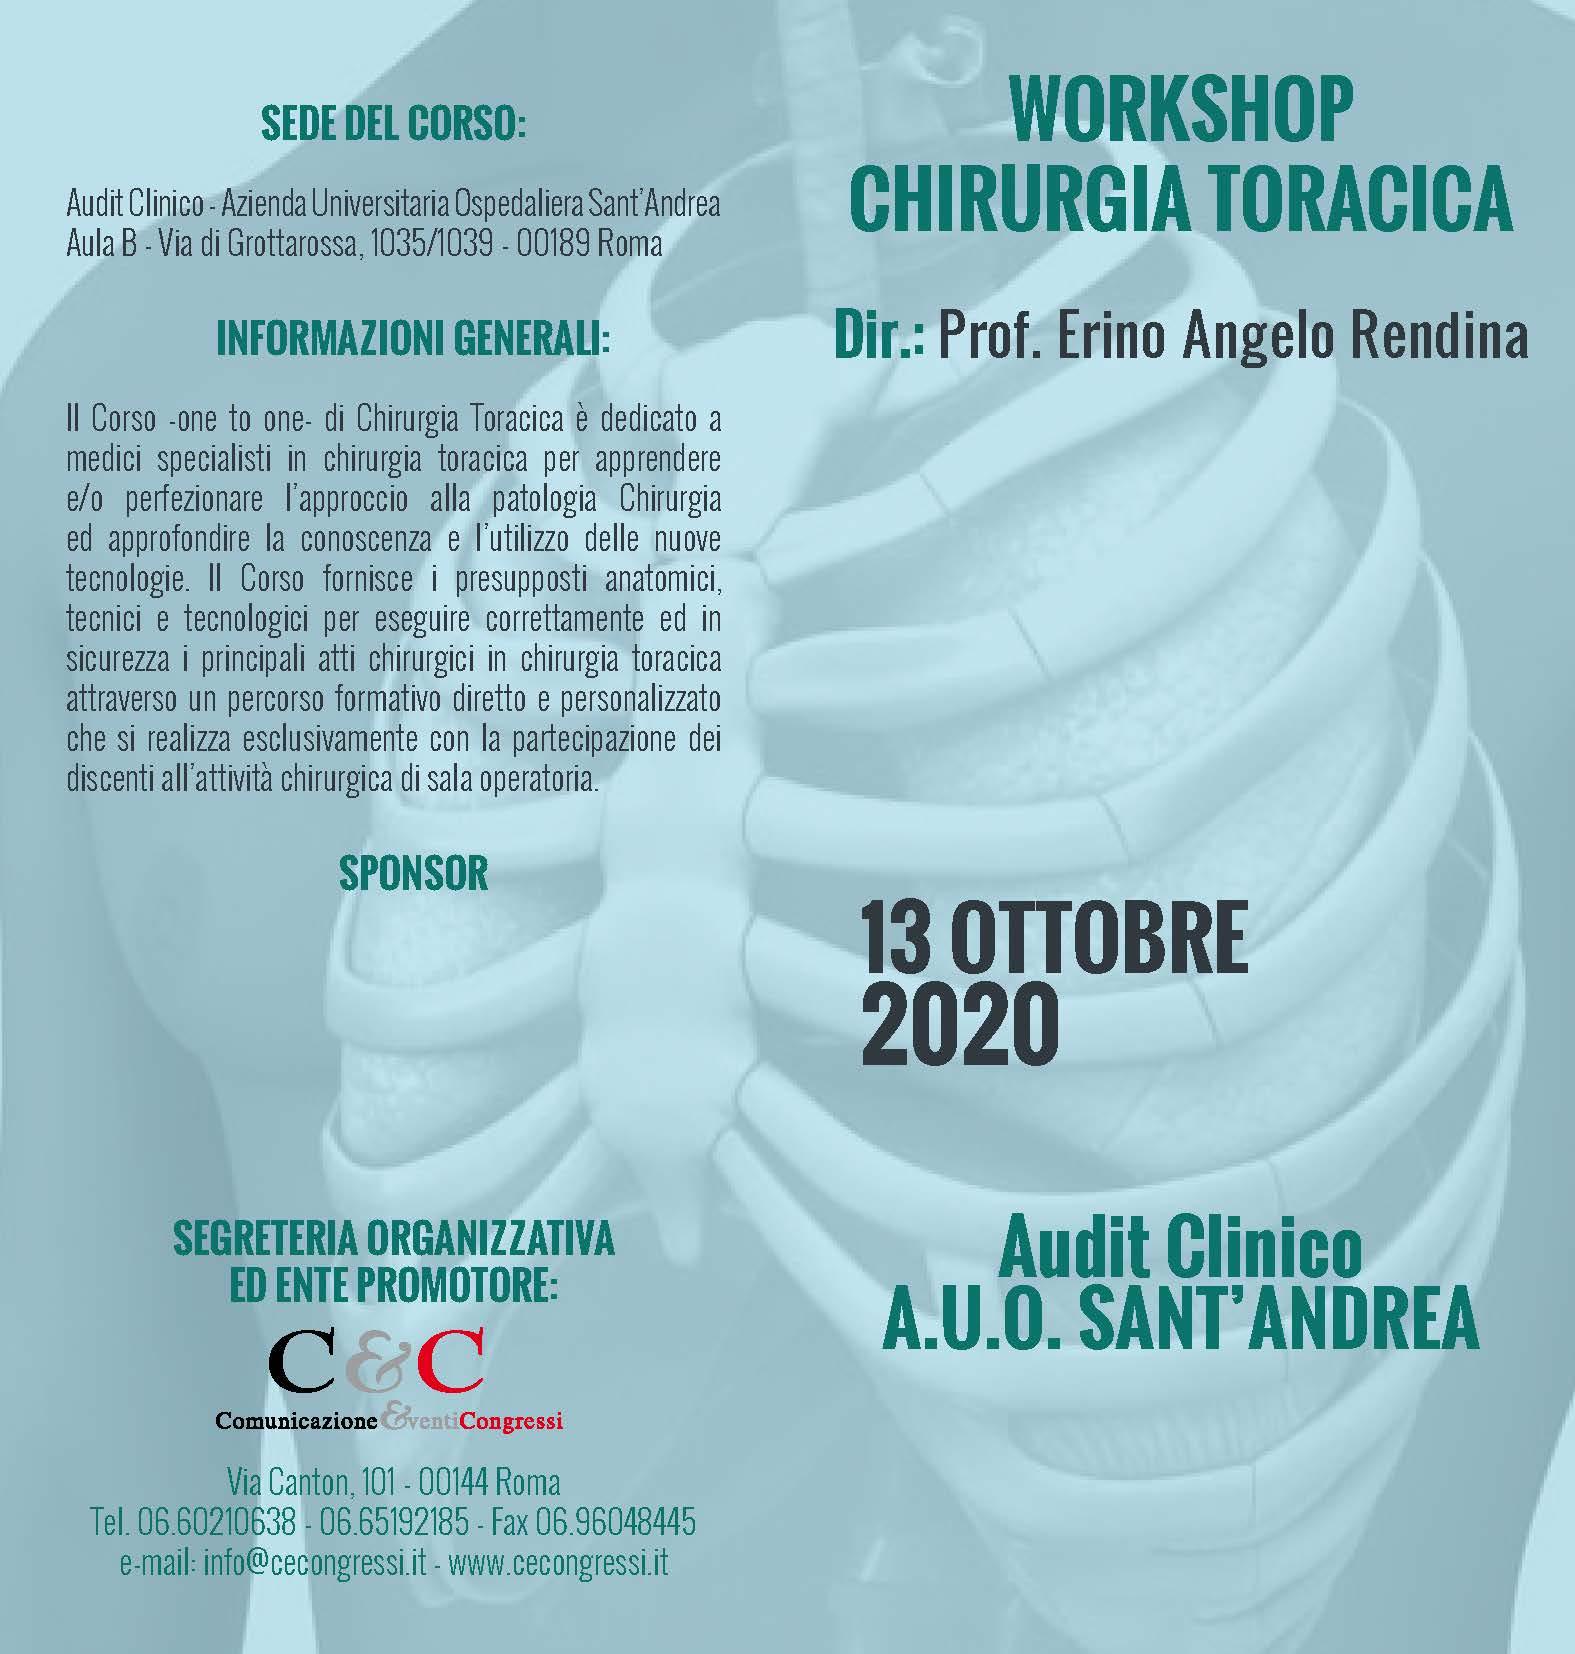 Workshop Chirurgia Toracica – Presidente E. A. Rendina